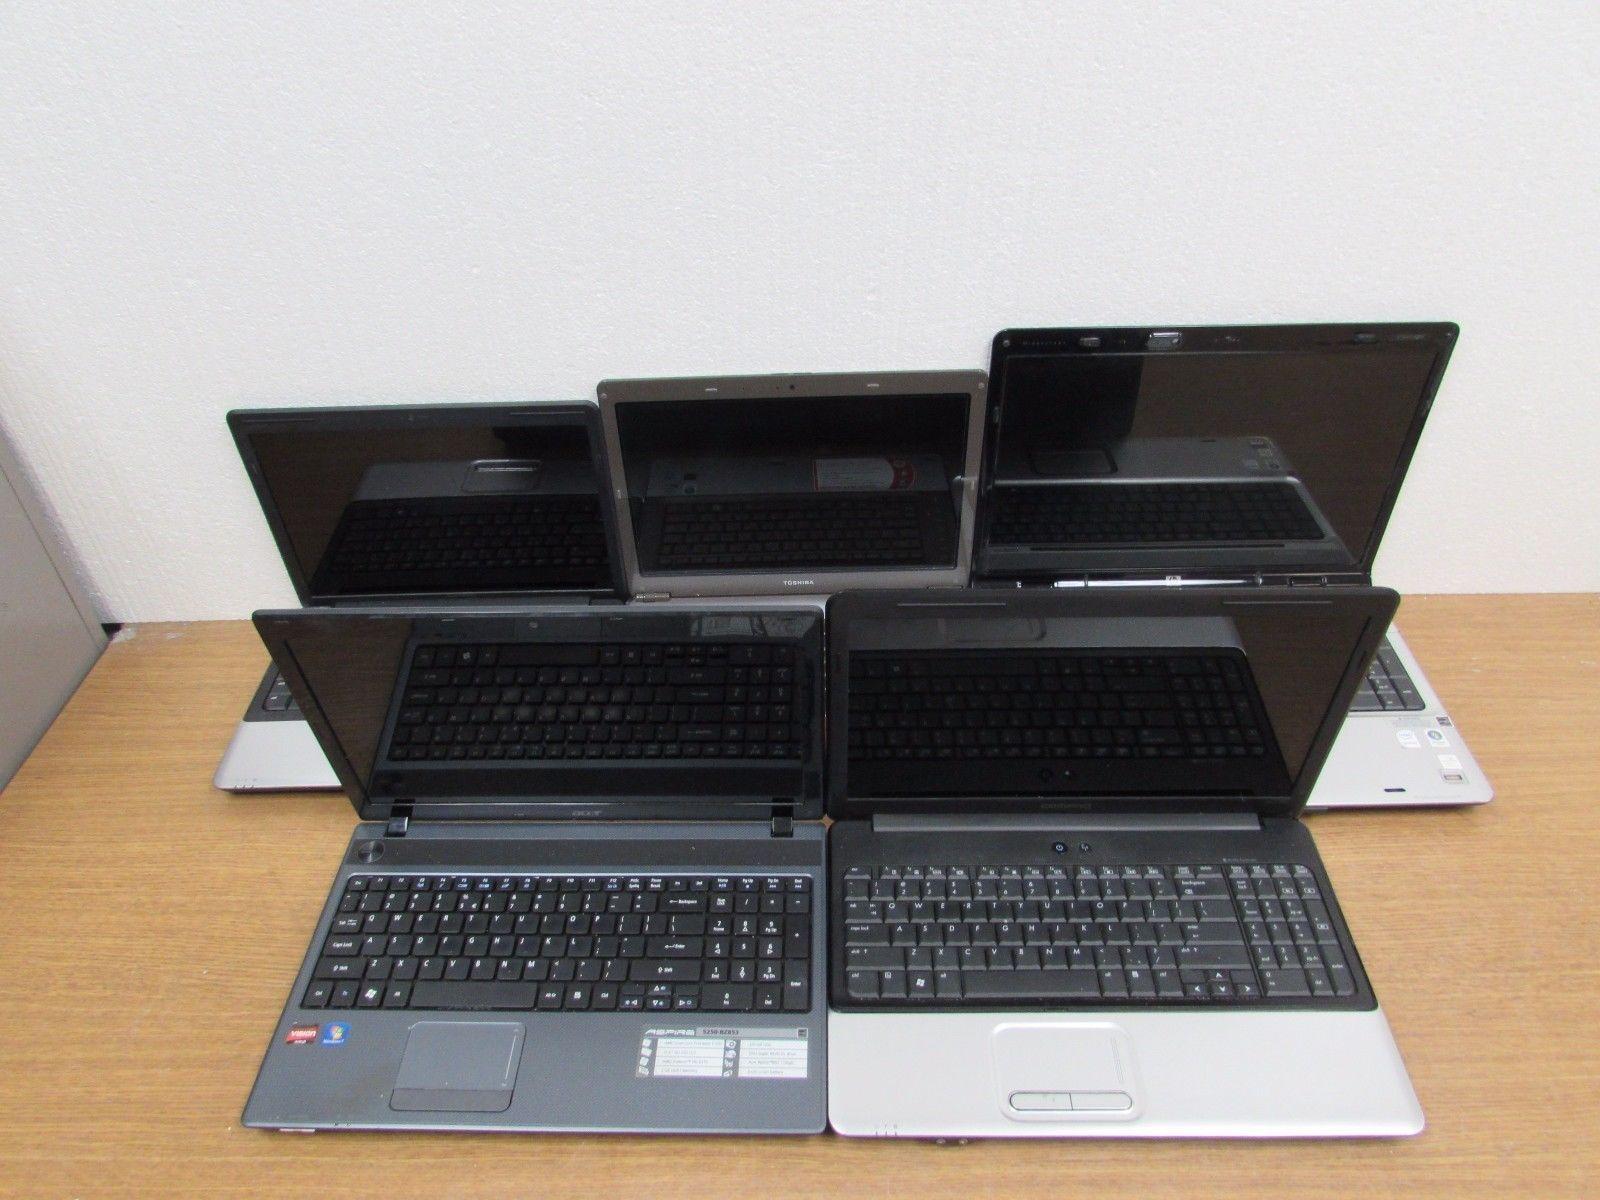 Lot of 5 Hp Compaq Presario CQ40 Pavilion Presario CQ60 Toshiba Acer Aspire5250